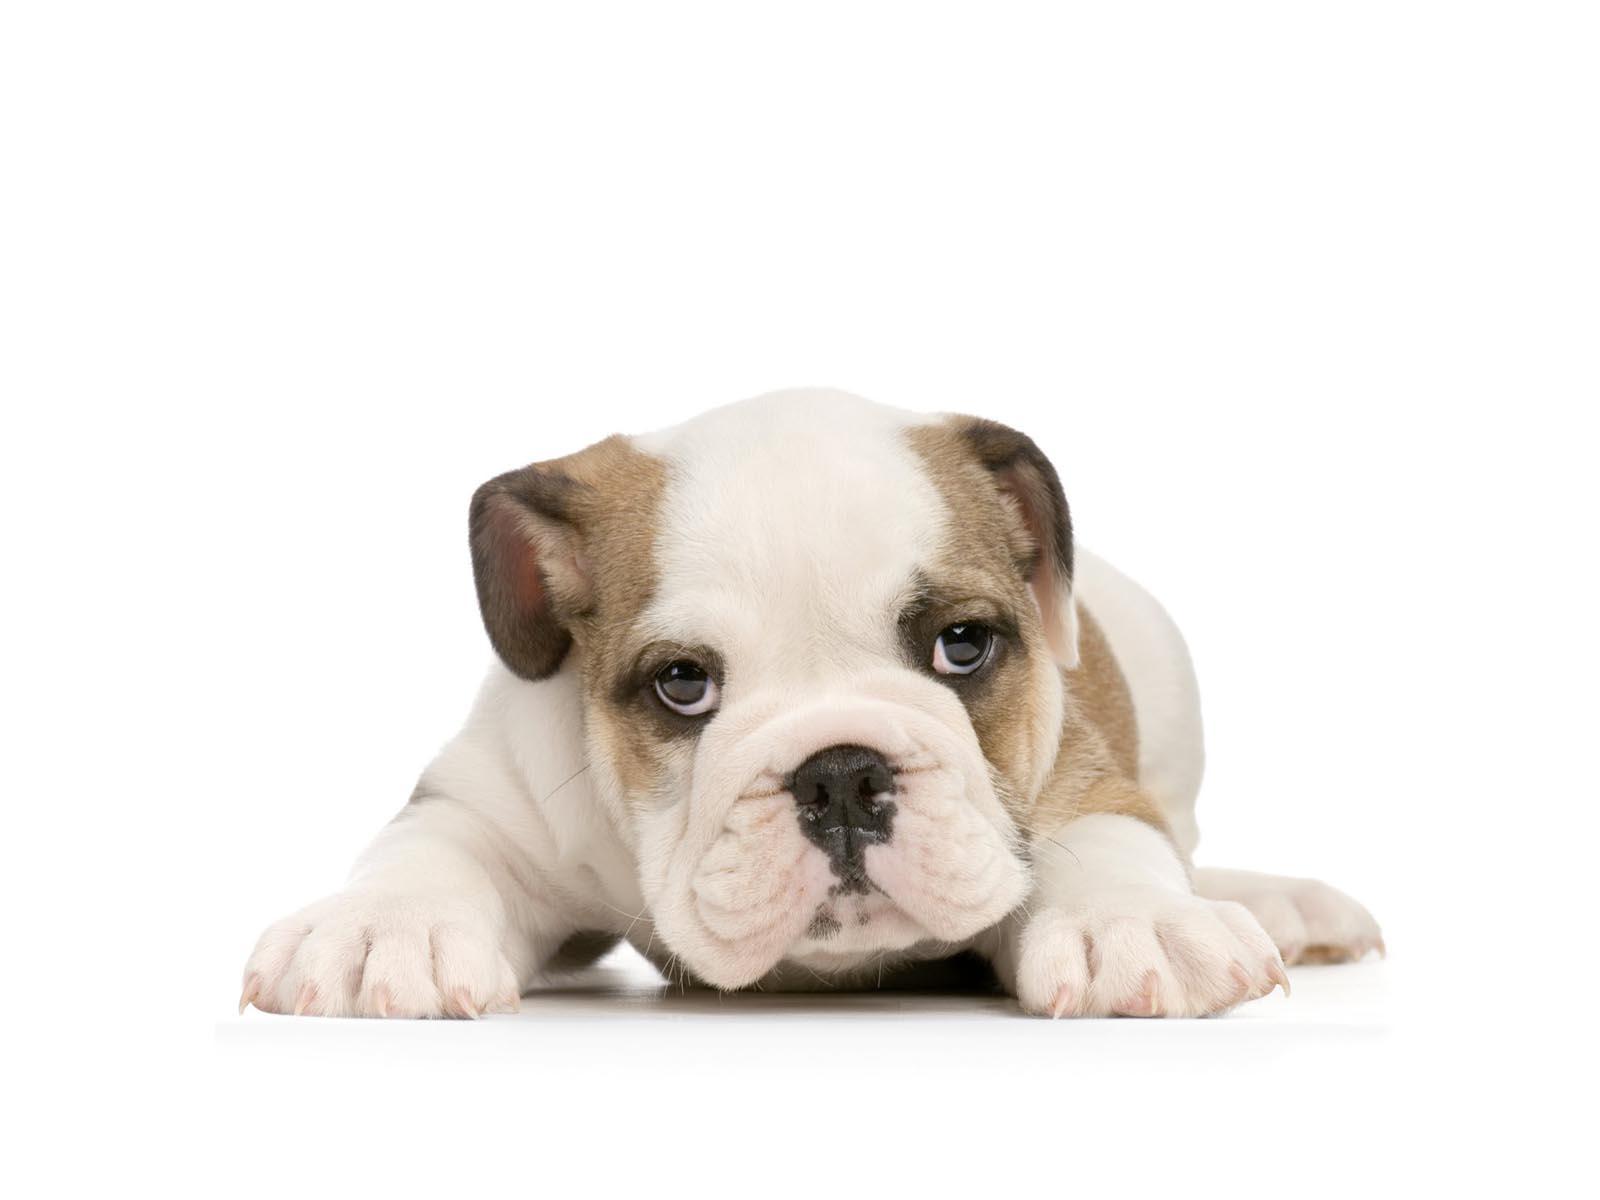 Cute bulldog wallpapers - photo#23